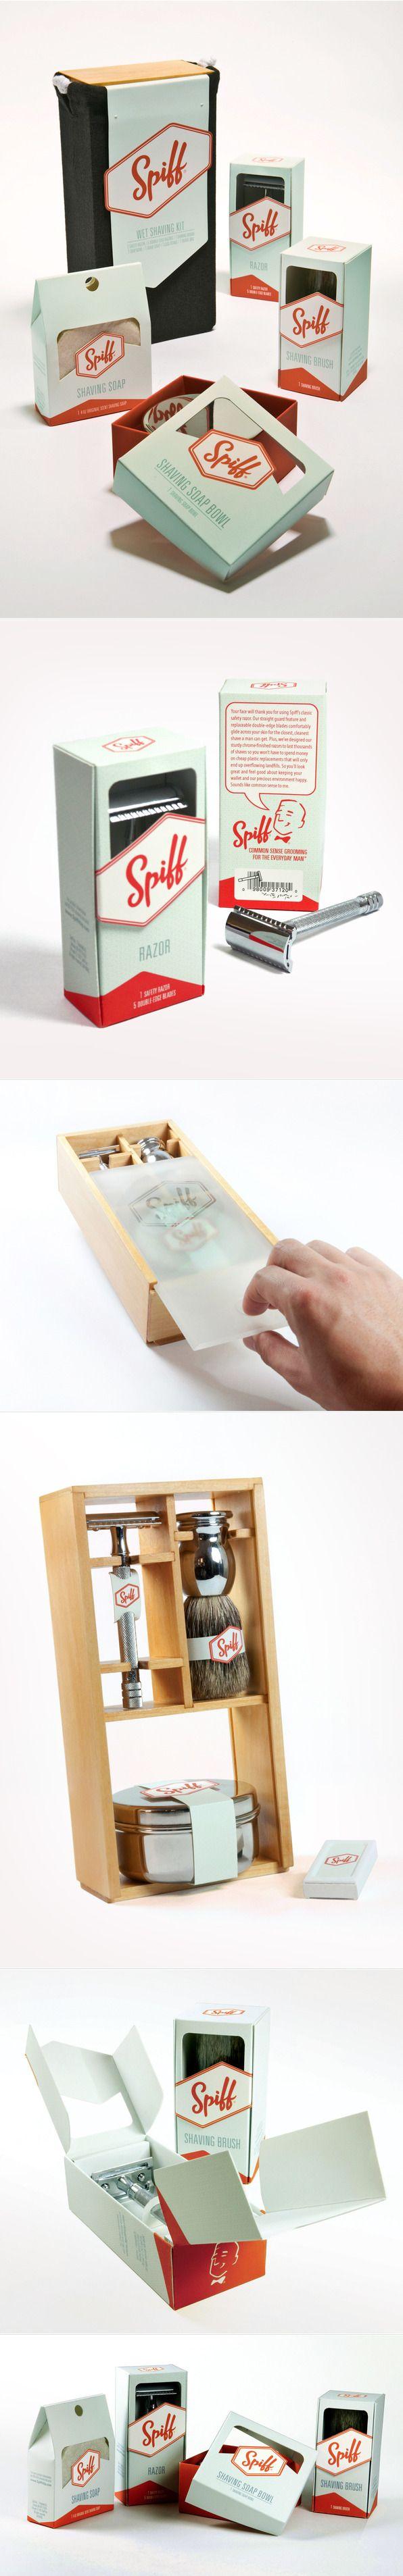 Unique Packaging Design, Spiff #packaging #design (http://www.pinterest.com/aldenchong/)